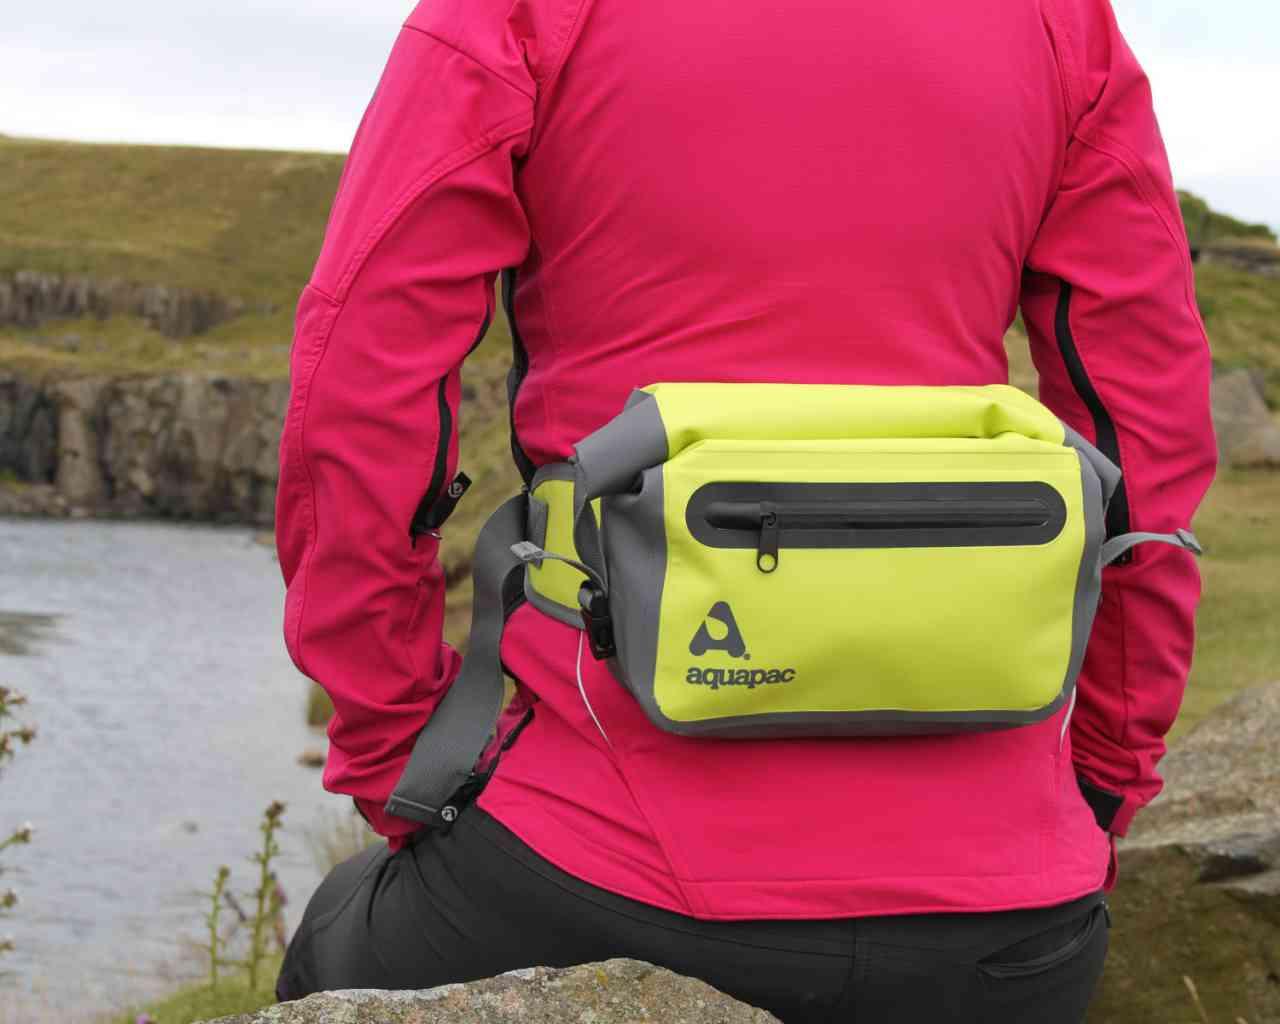 Водонепроницаемый чехол для документов - Aquapac 821. Aquapac - №1 в мире водонепроницаемых чехлов и сумок. Фото 5